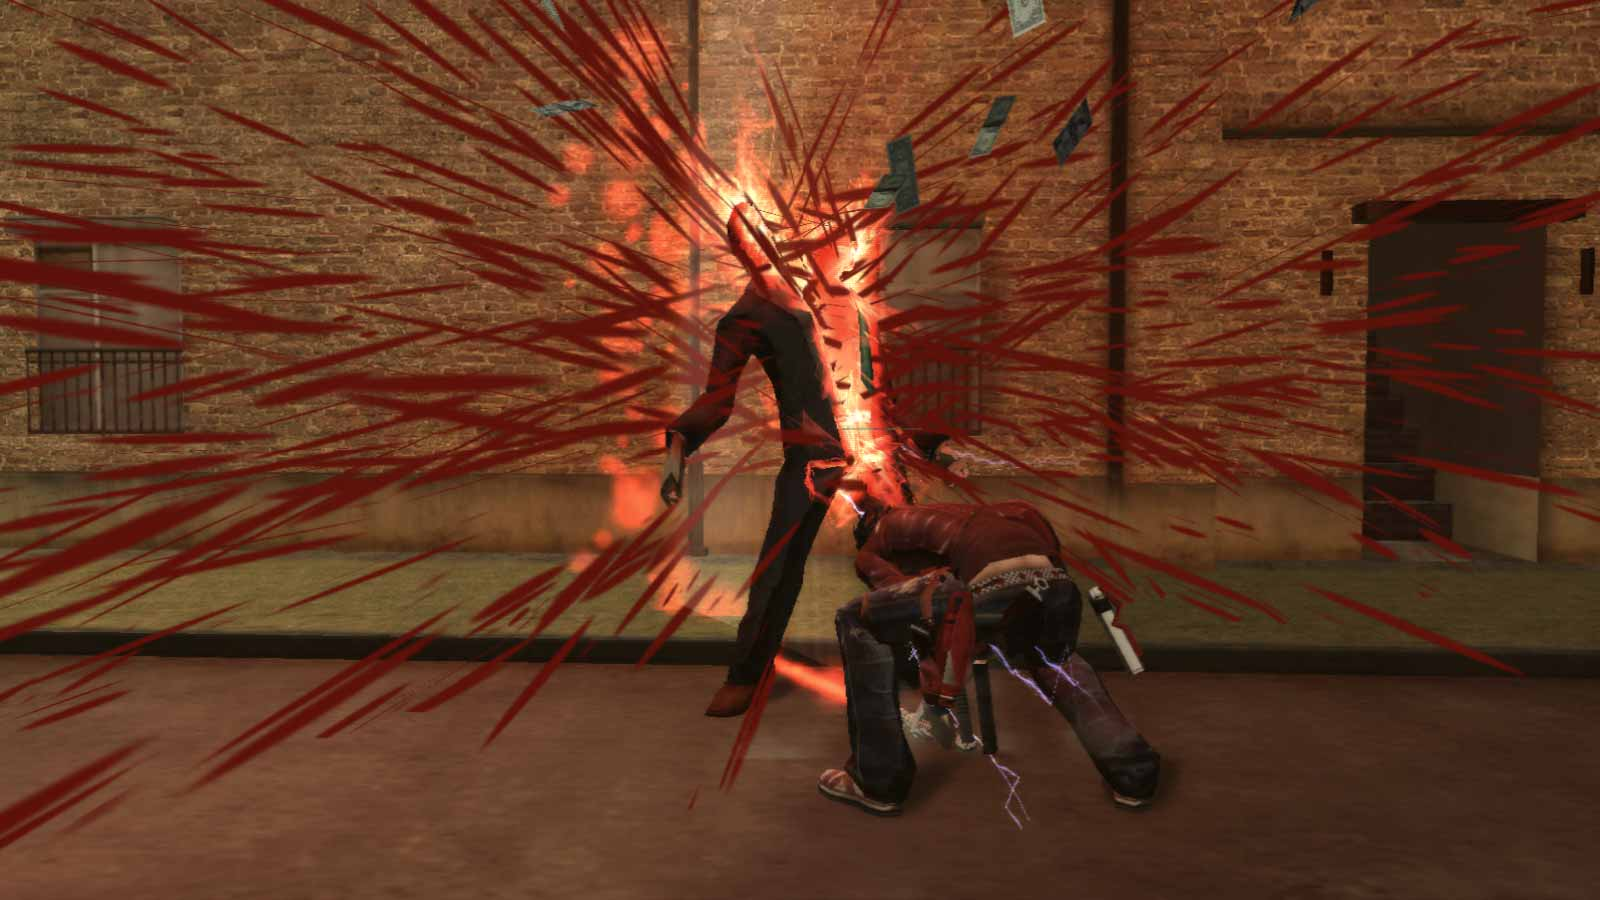 Una scena di un videogame violento